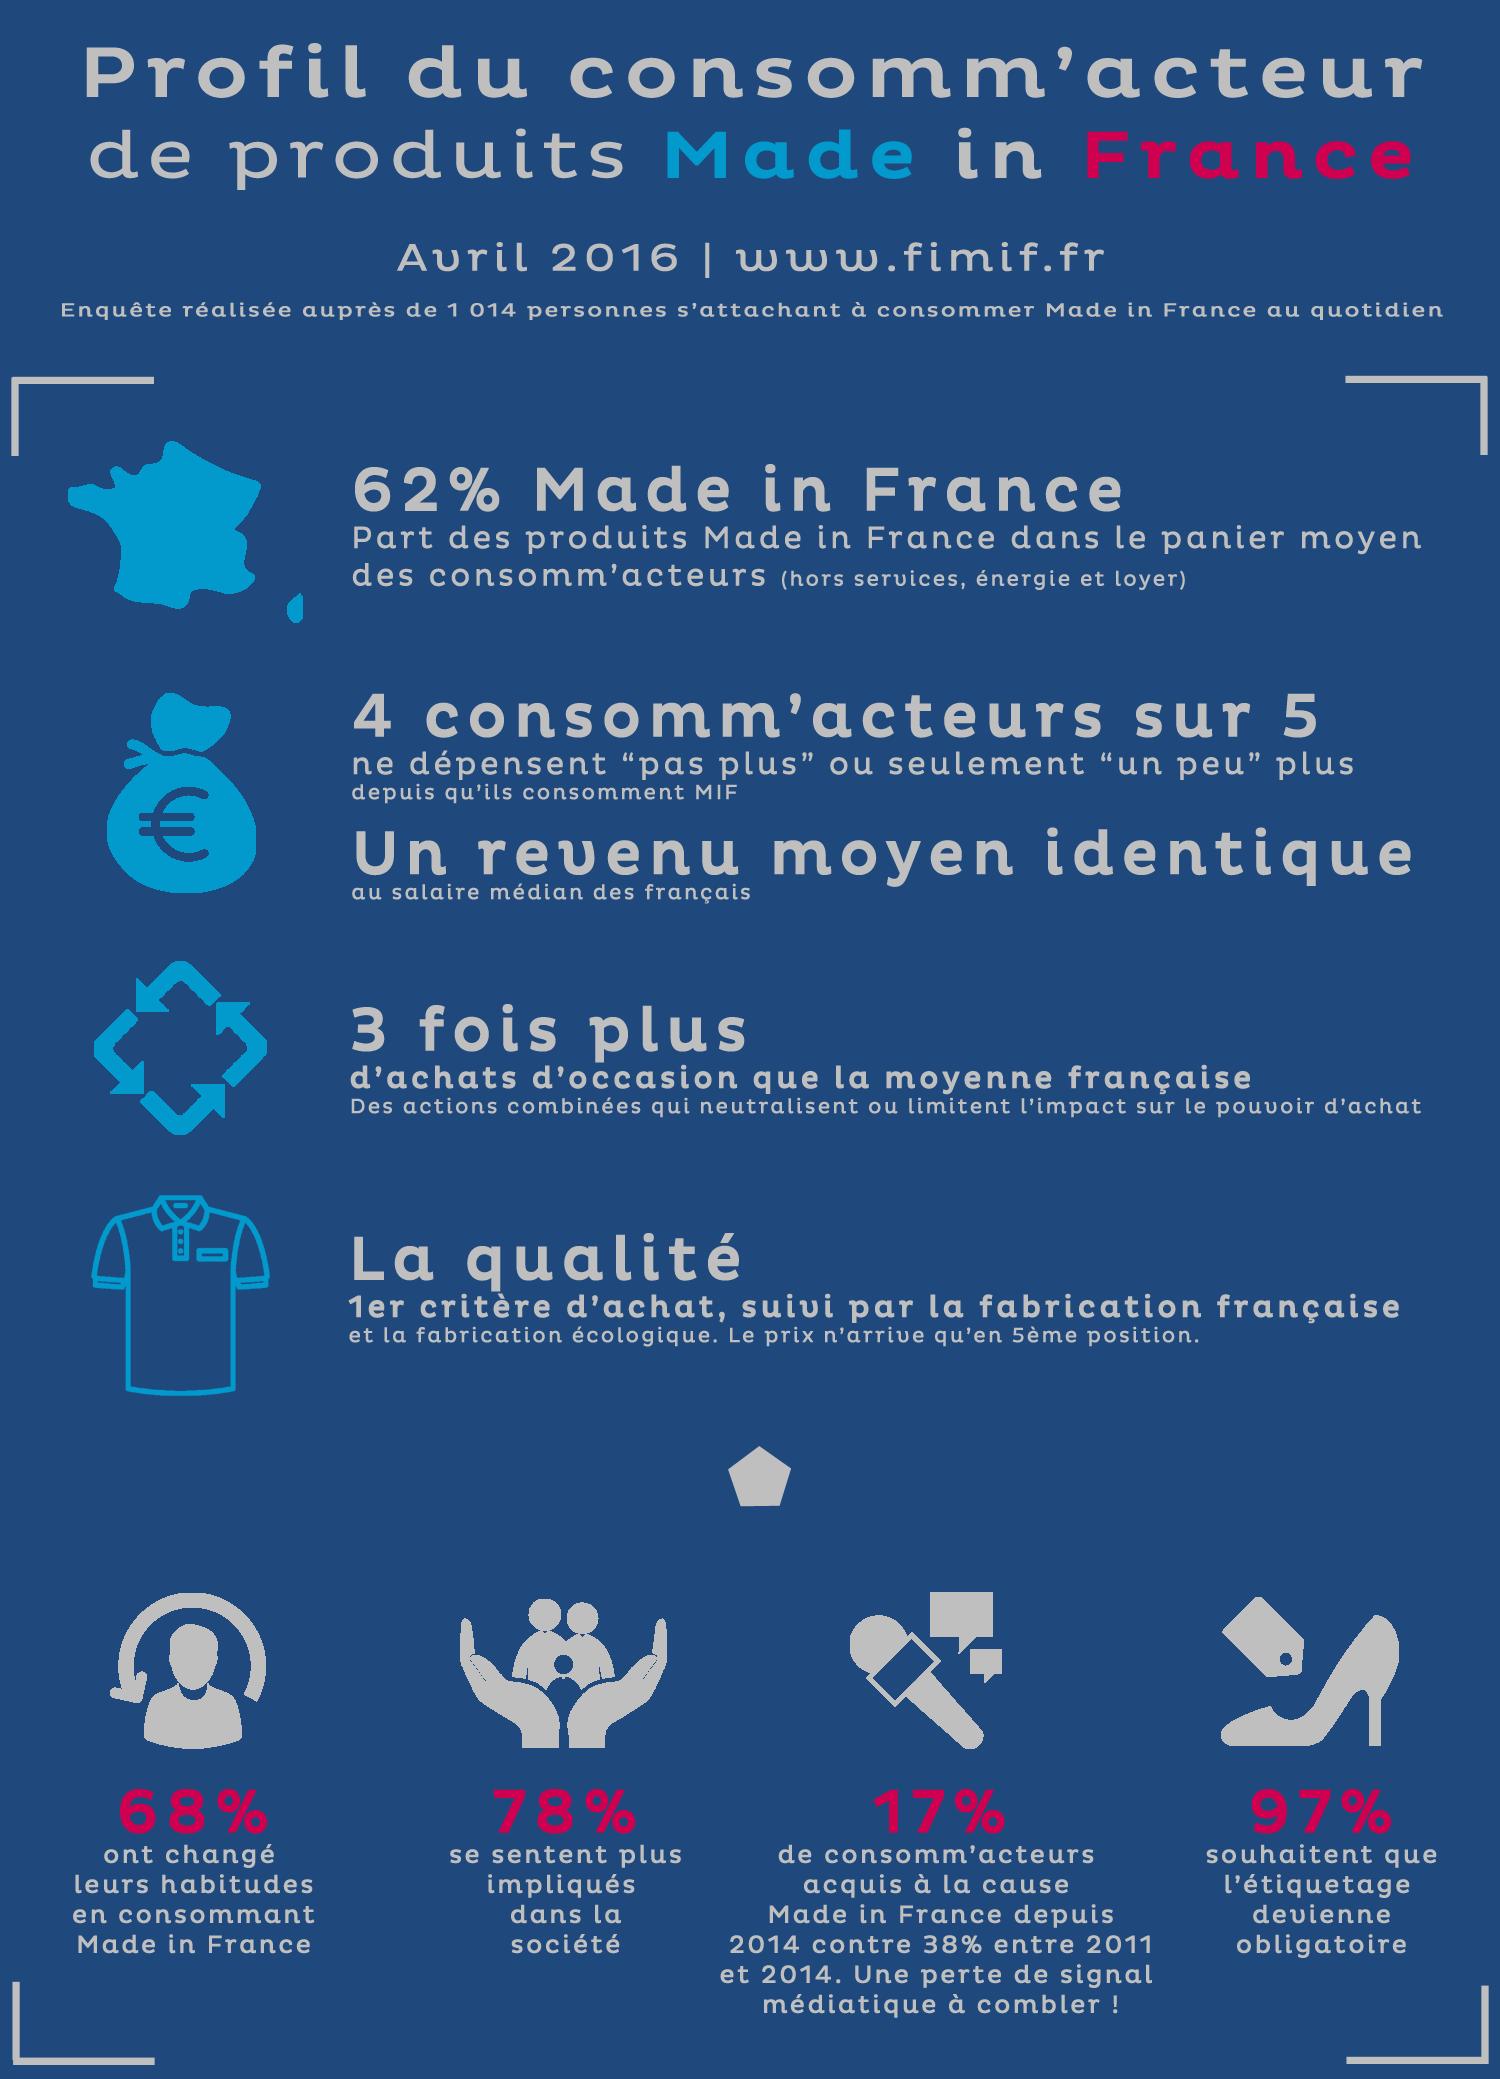 Profil du consomm'acteur Made in France